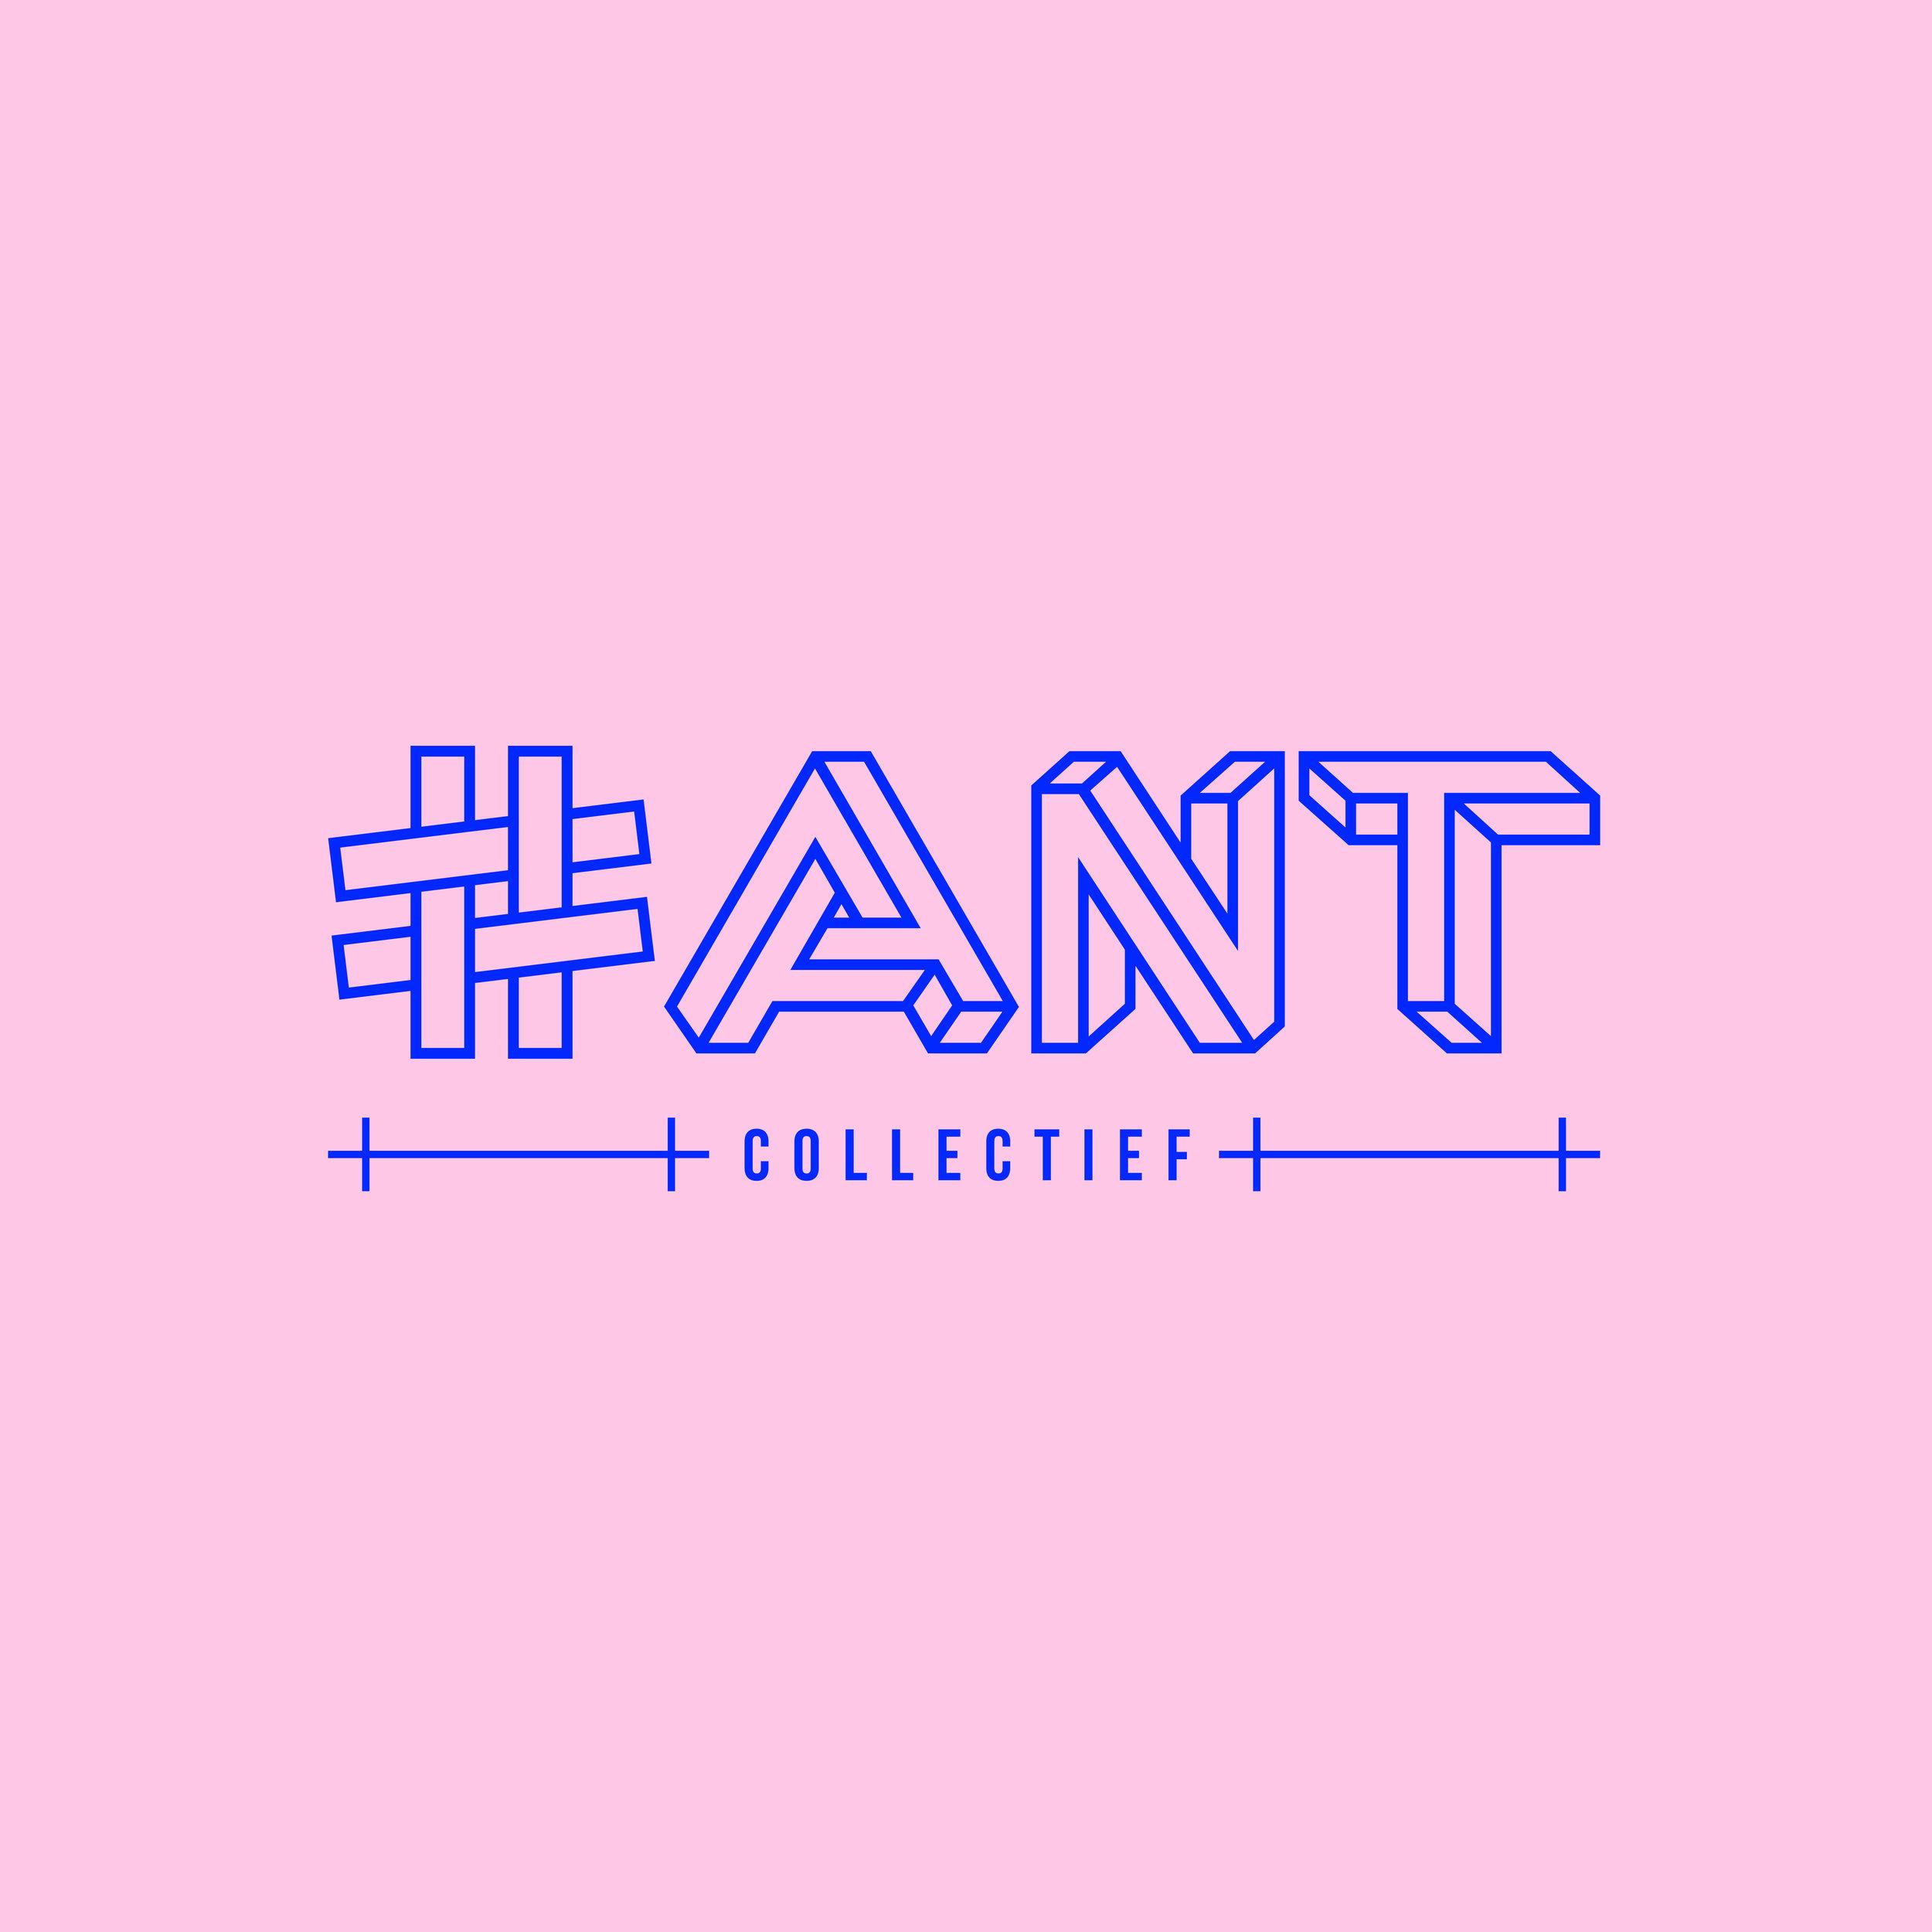 ant collectief logo door melanie velghe.jpg